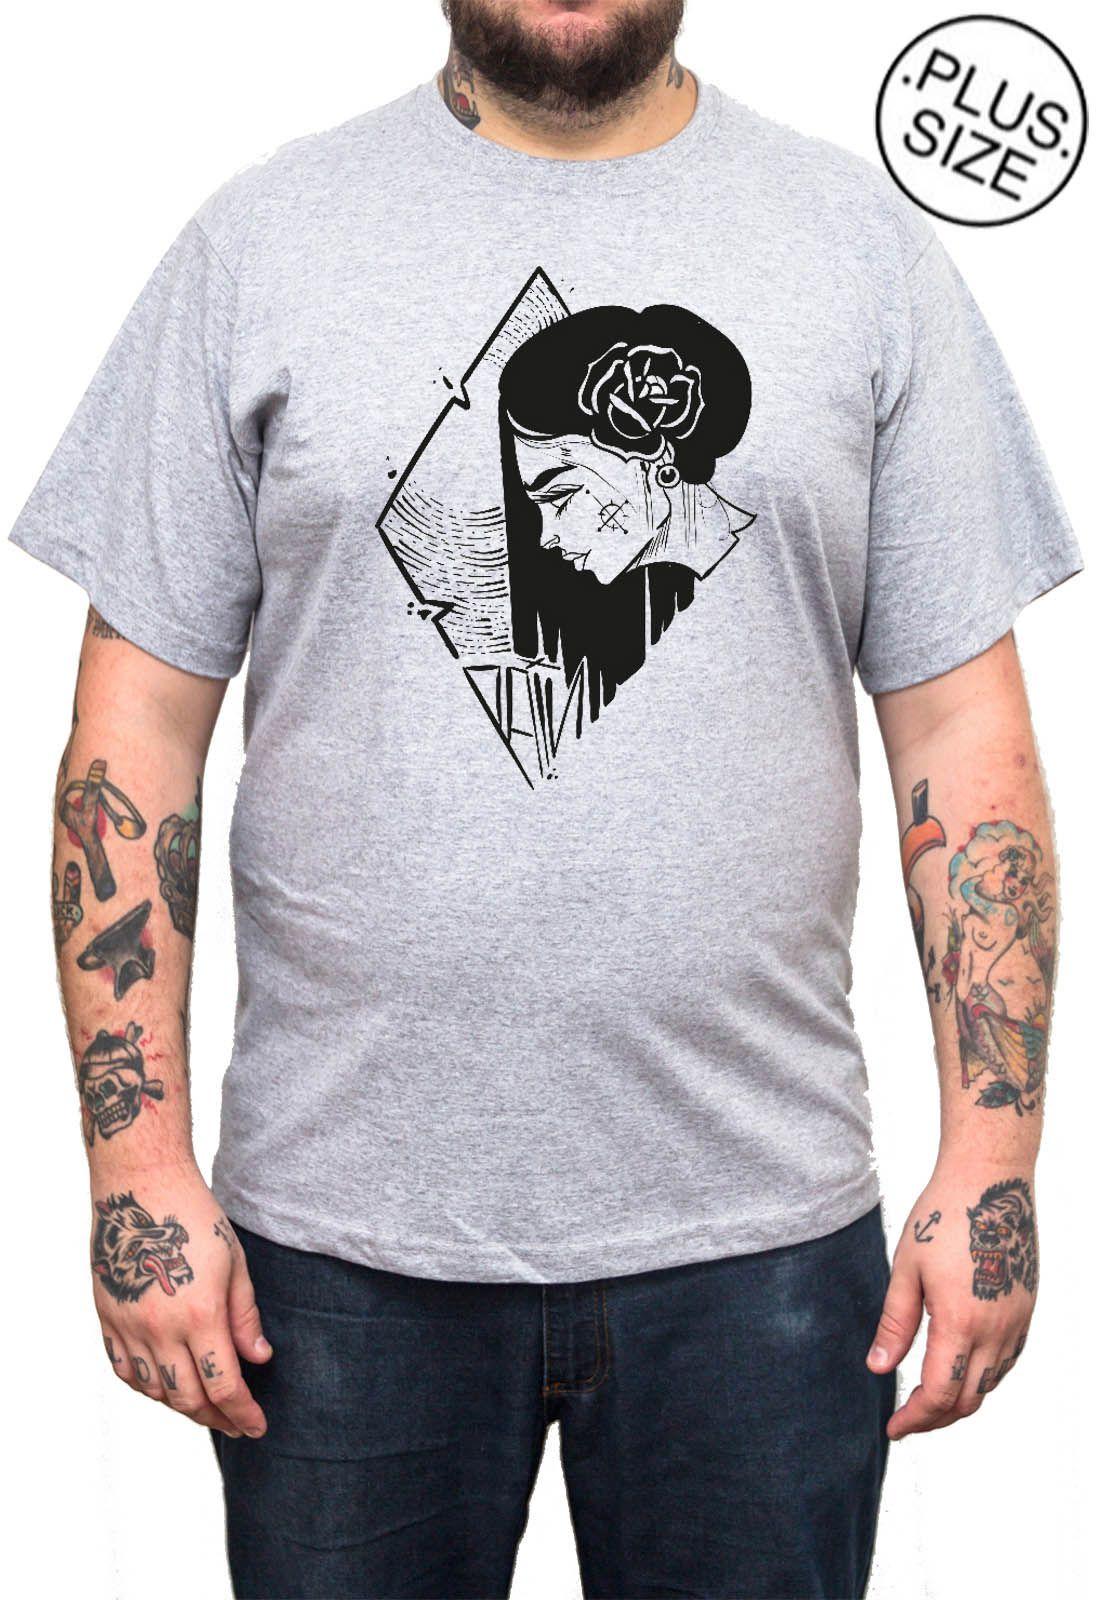 Camiseta Hshop Girlz - Cinza Mescla - Plus Size - Tamanho Grande XG  - HShop